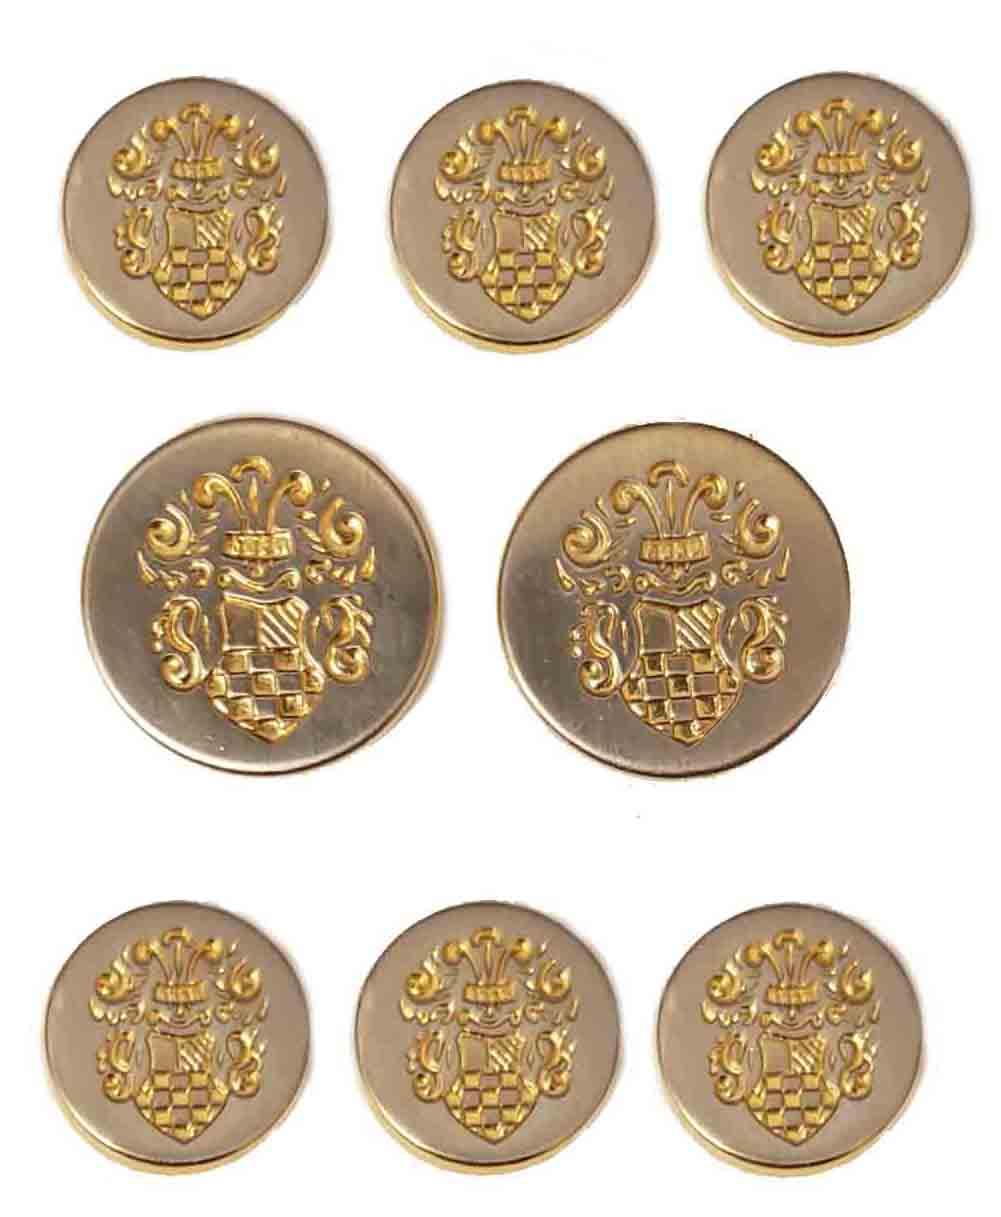 Vintage Botany 500 Blazer Buttons Set Silver Gold Metal Ornate Shield Pattern Men's